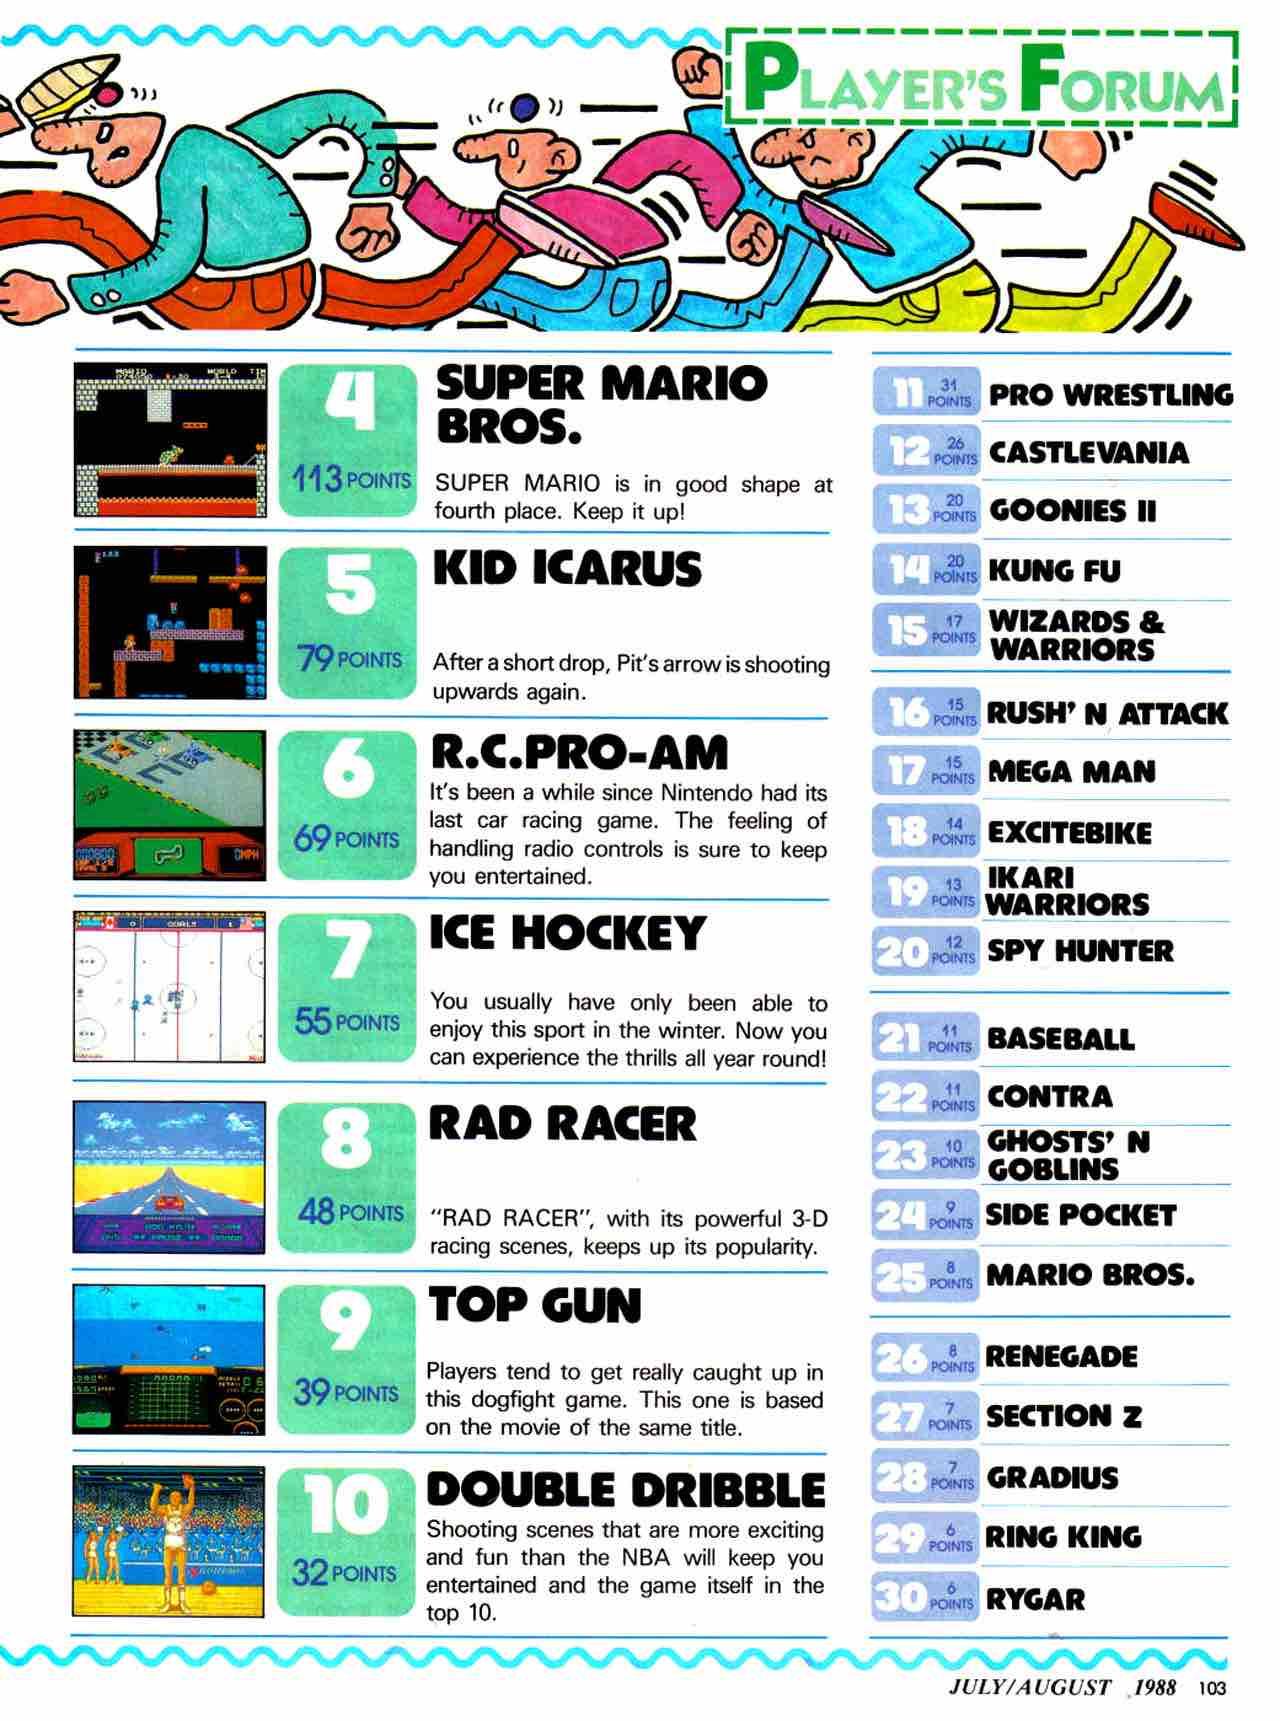 Nintendo Power | July August 1988 - pg 103